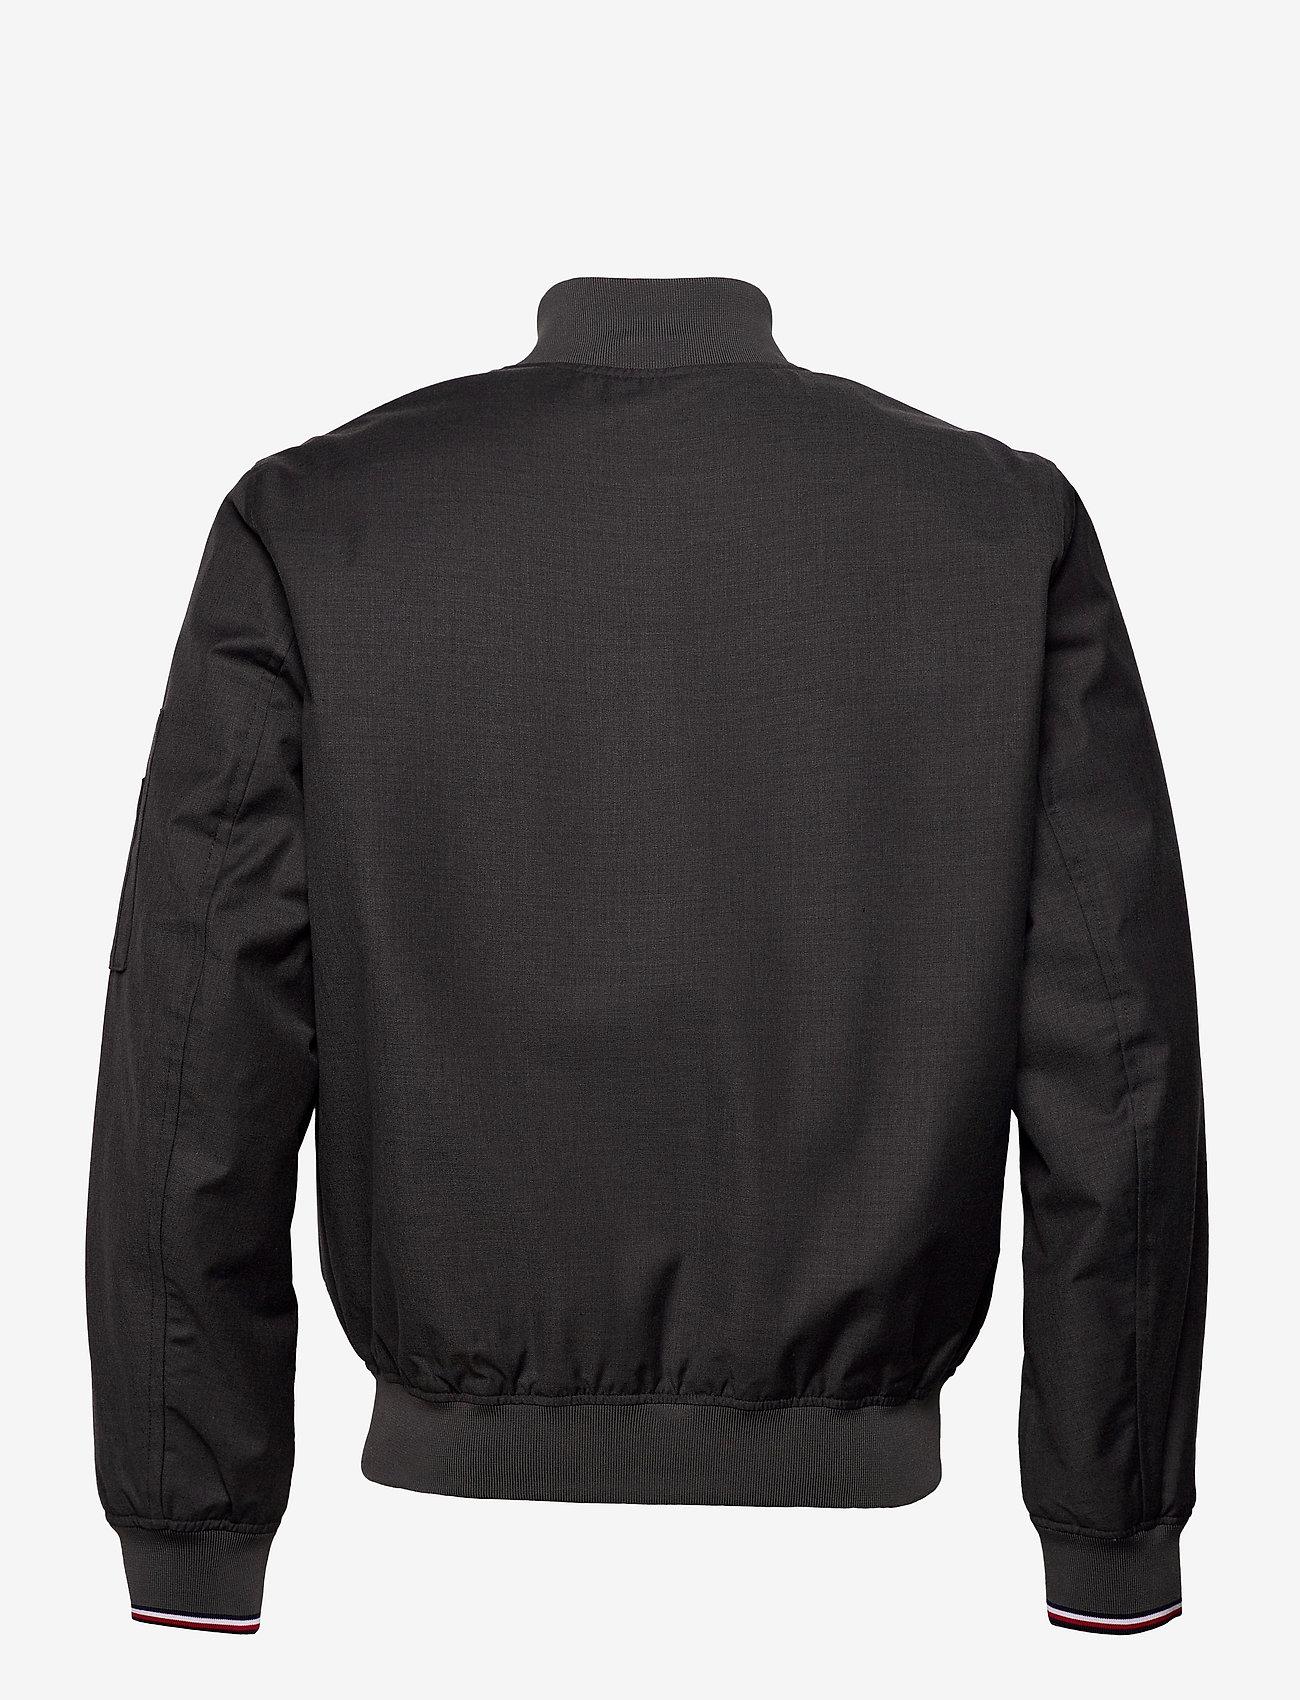 Tommy Hilfiger - 2 MB TECH BOMBER JKT - bomber jackets - dark grey heather - 1